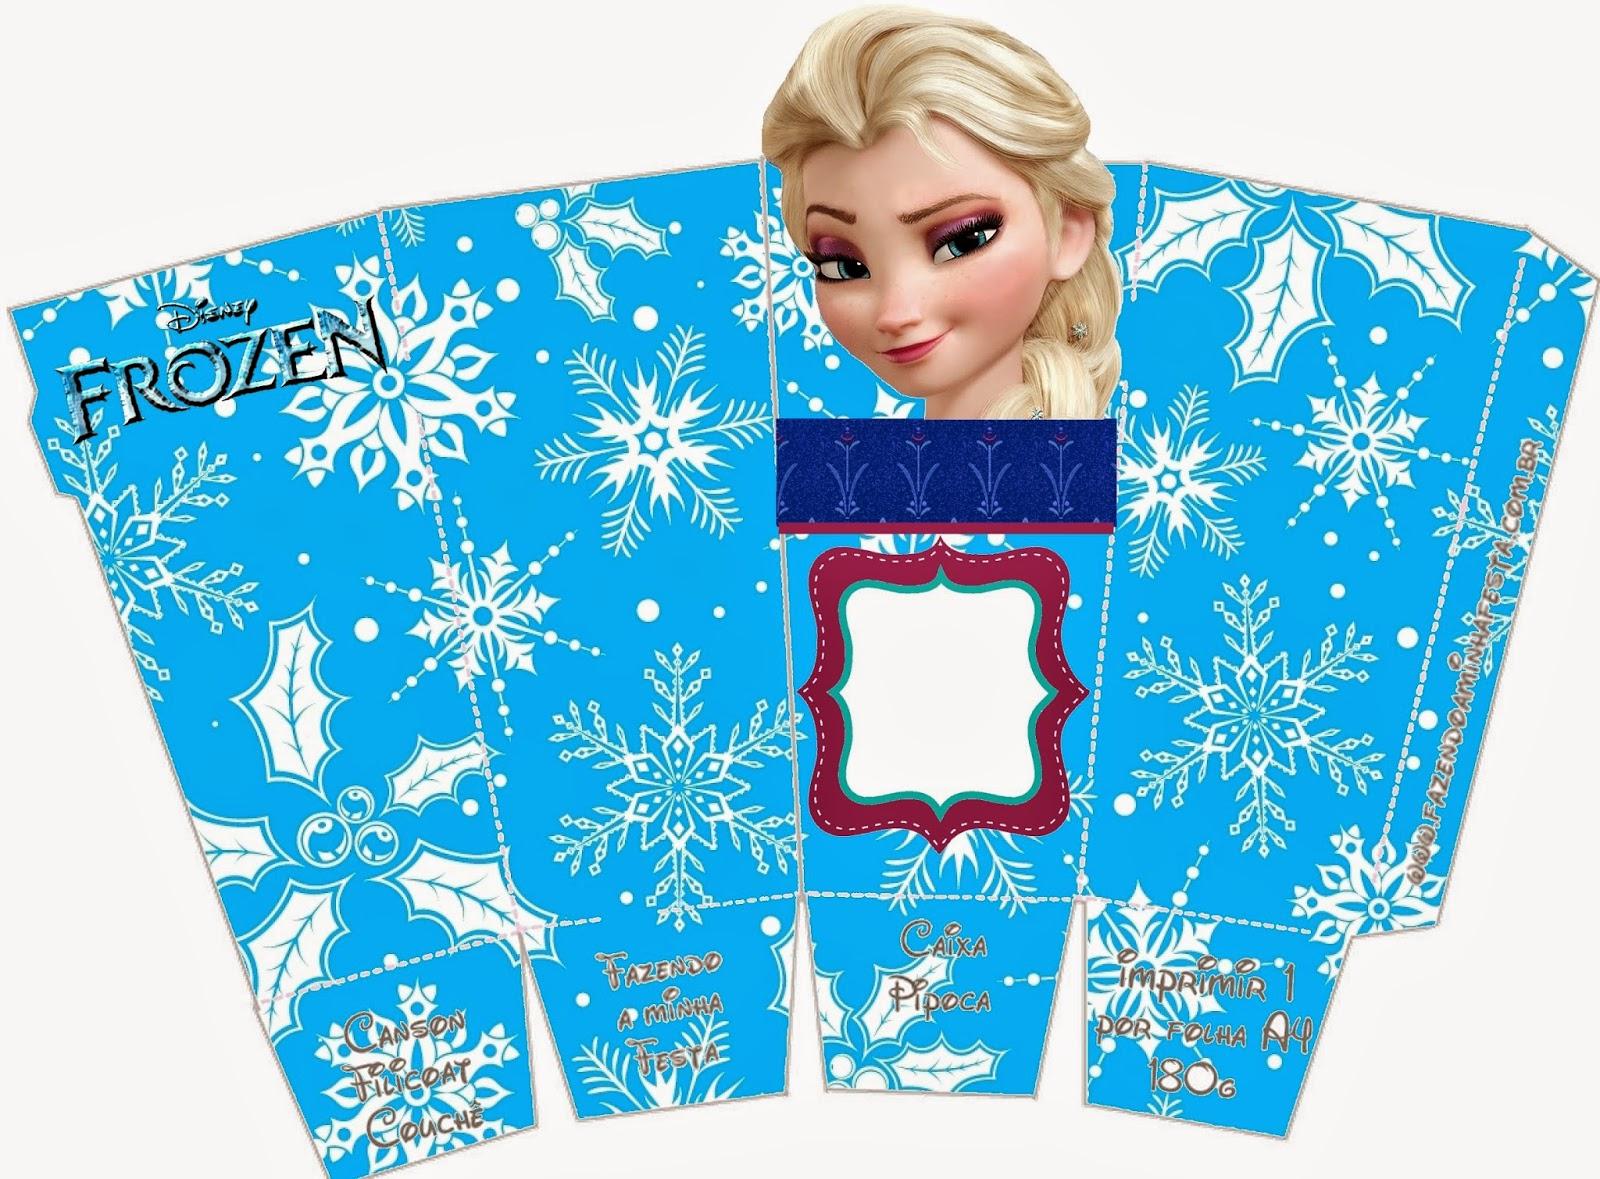 Frozen: Caja de Elsa para Popcorn, para Imprimir Gratis.